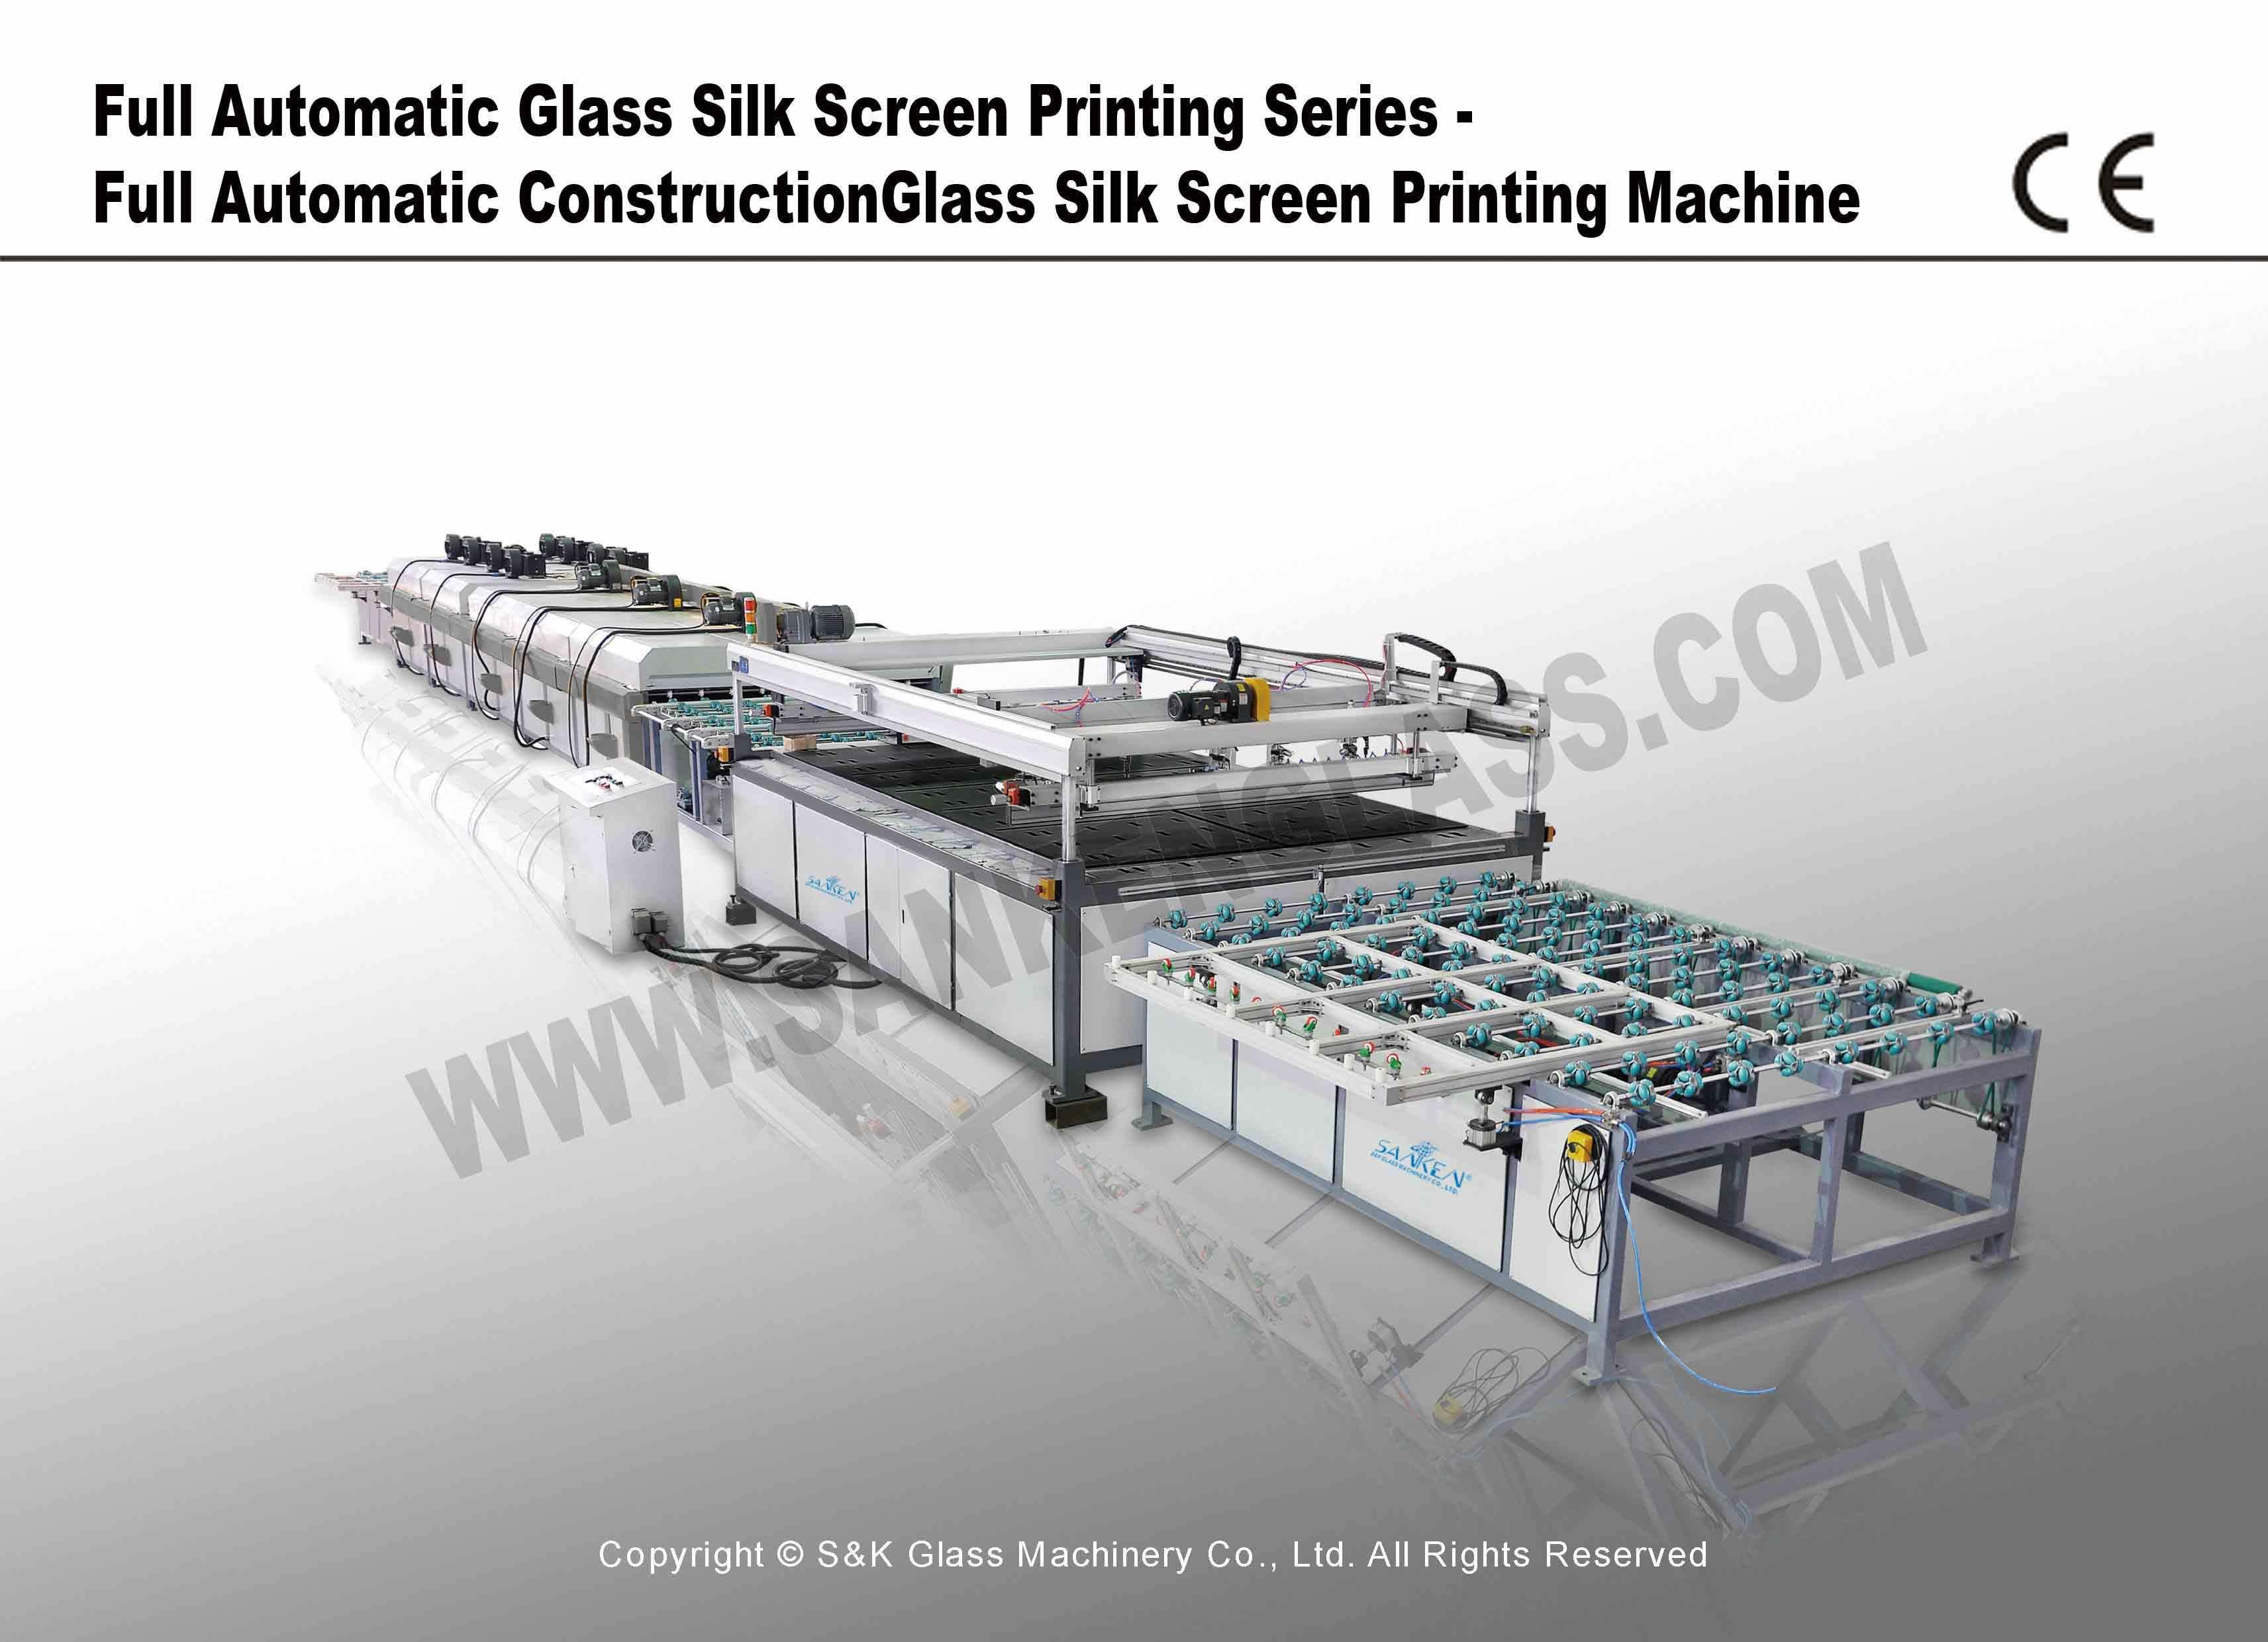 Full Automatic Construction Glass Silk Screen Printing Machine Ay-Gl2551